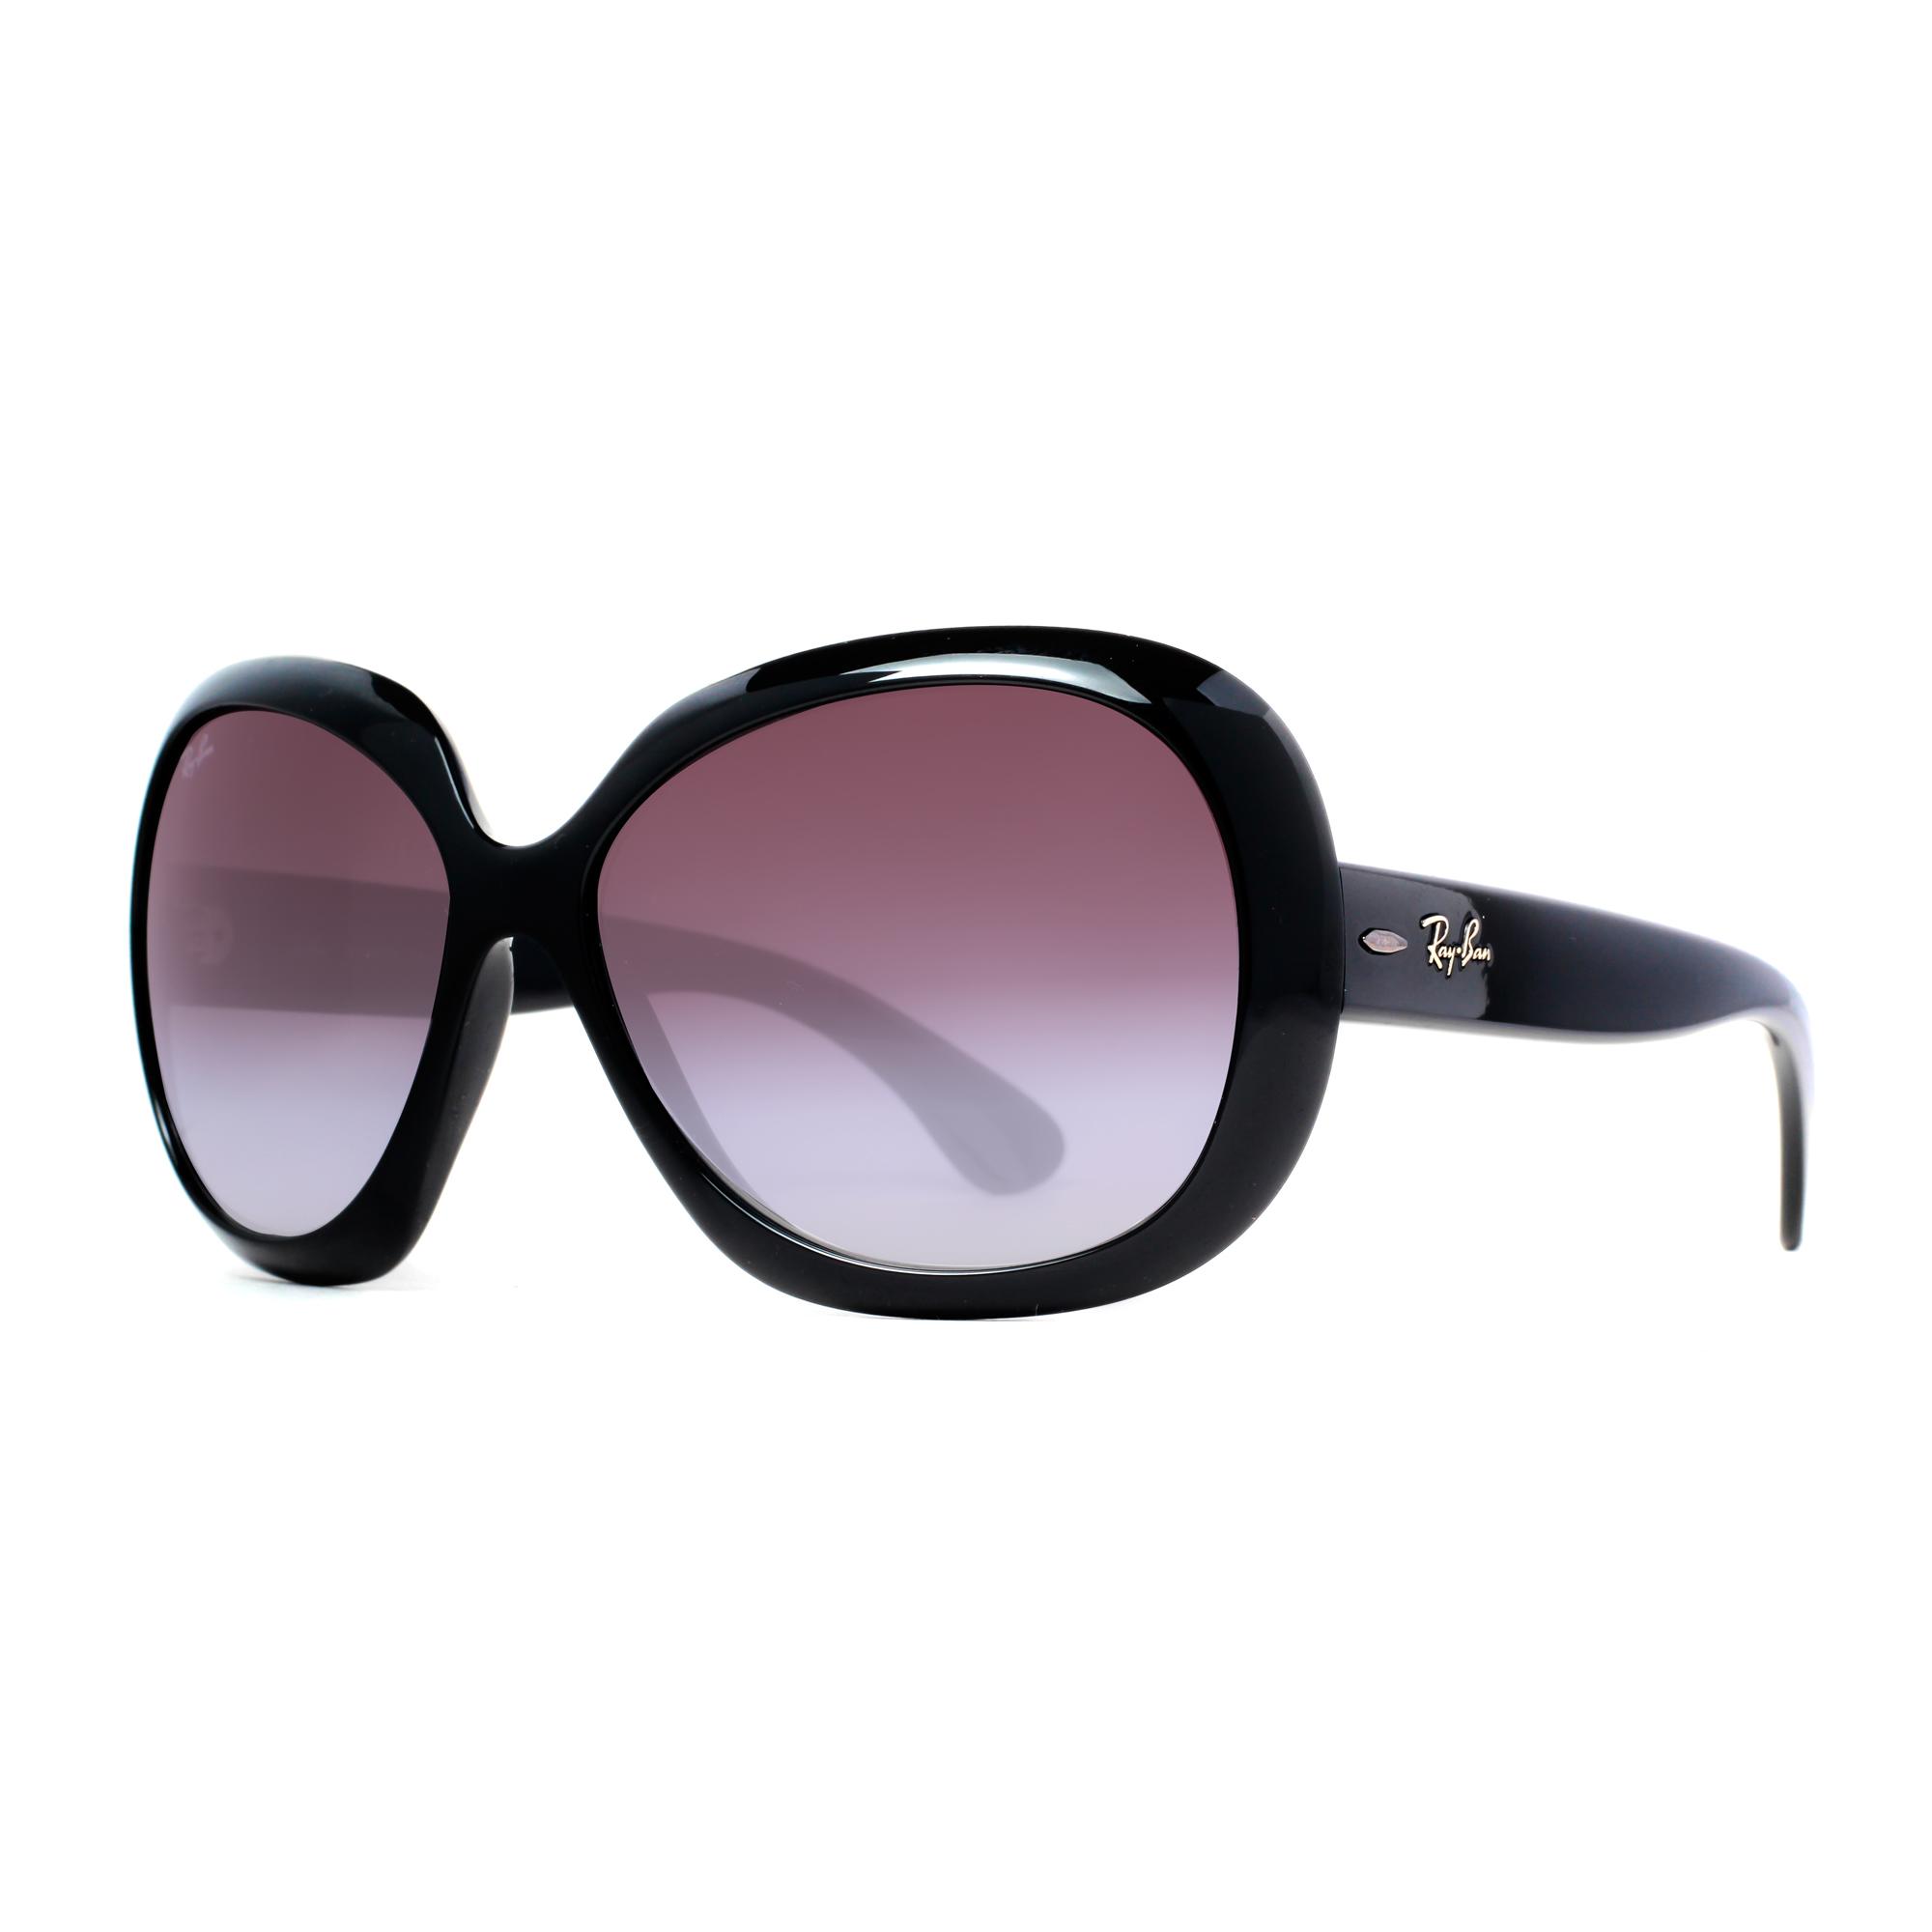 ray ban 4098 jackie ohh ii sunglasses louisiana bucket. Black Bedroom Furniture Sets. Home Design Ideas